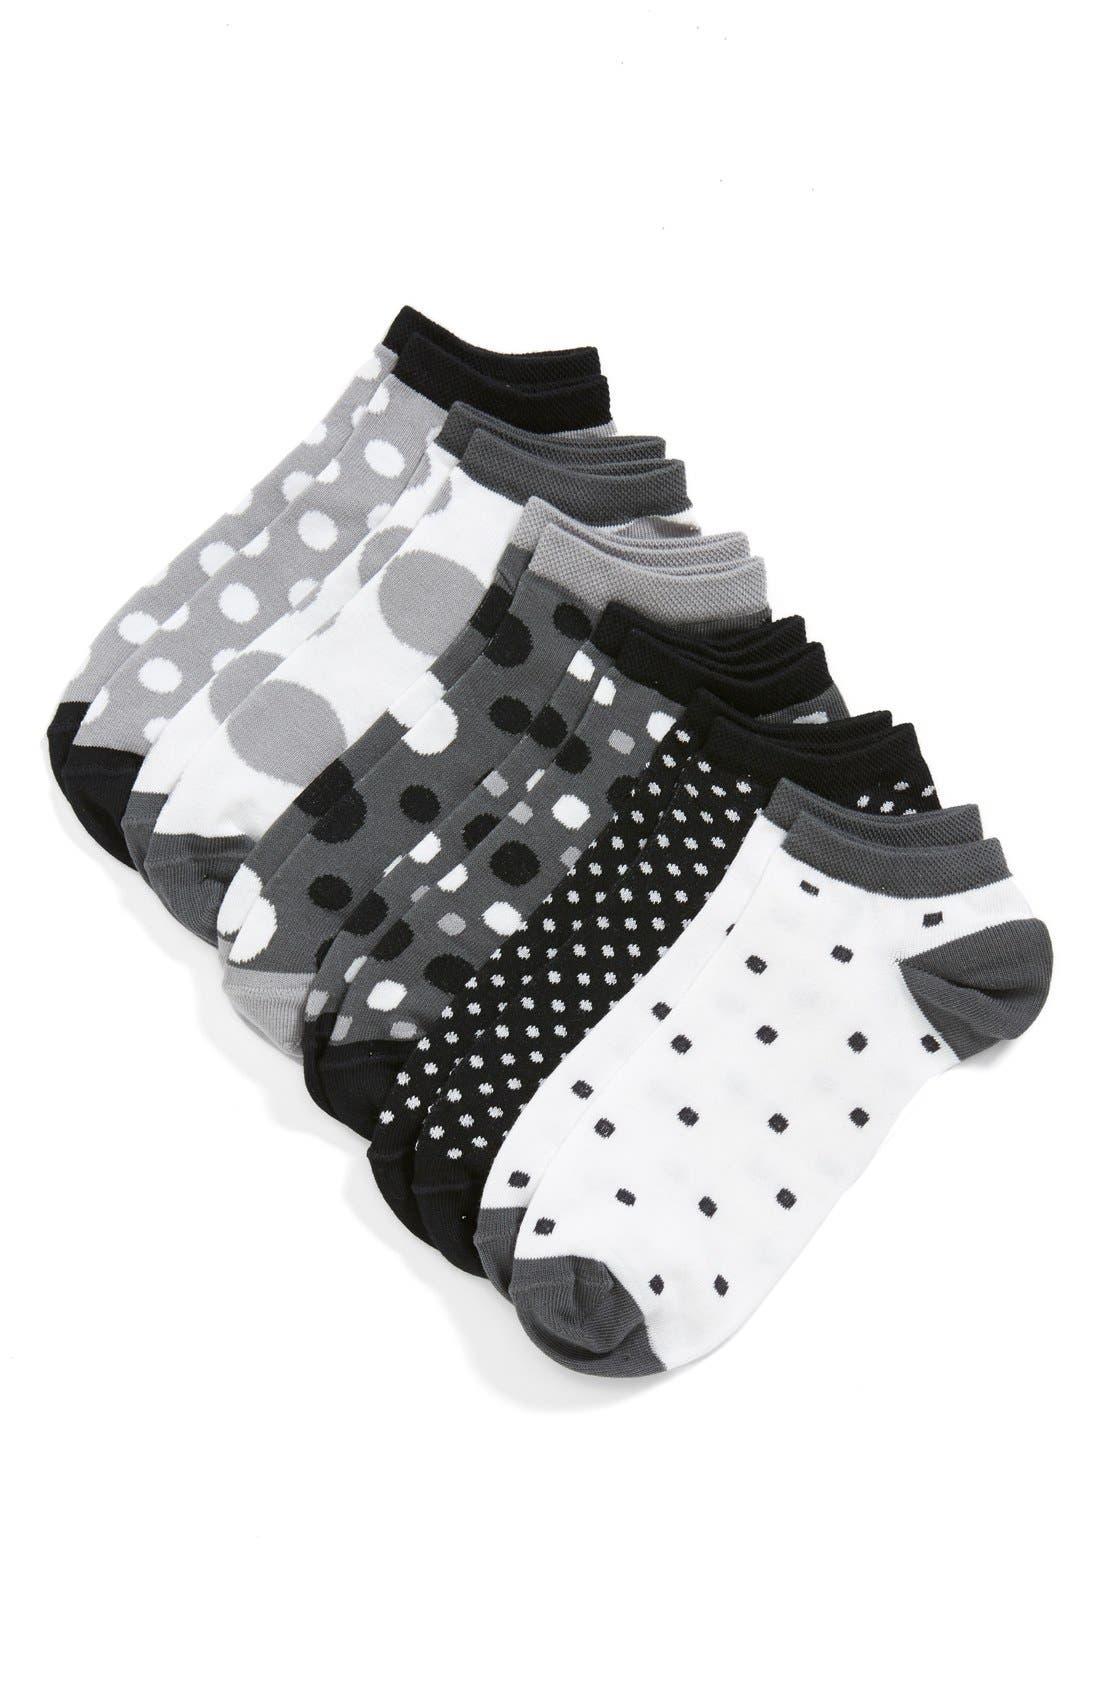 Main Image - Tucker + Tate 'Dotty Dots' Low-Cut Socks (6-Pack) (Toddler, Little Kid & Big Kid)